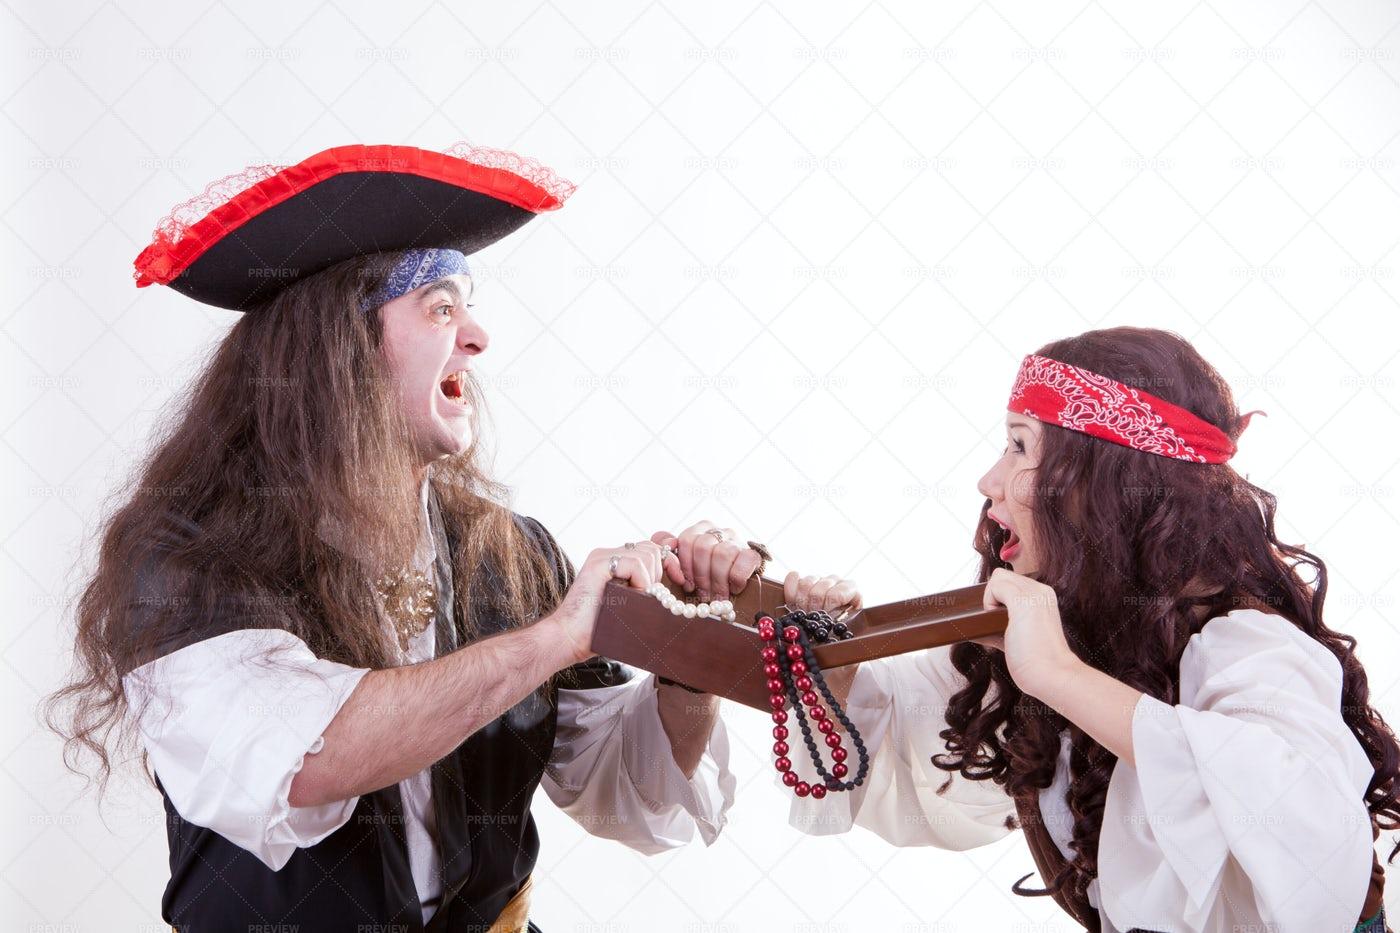 Greedy Pirates Fight: Stock Photos